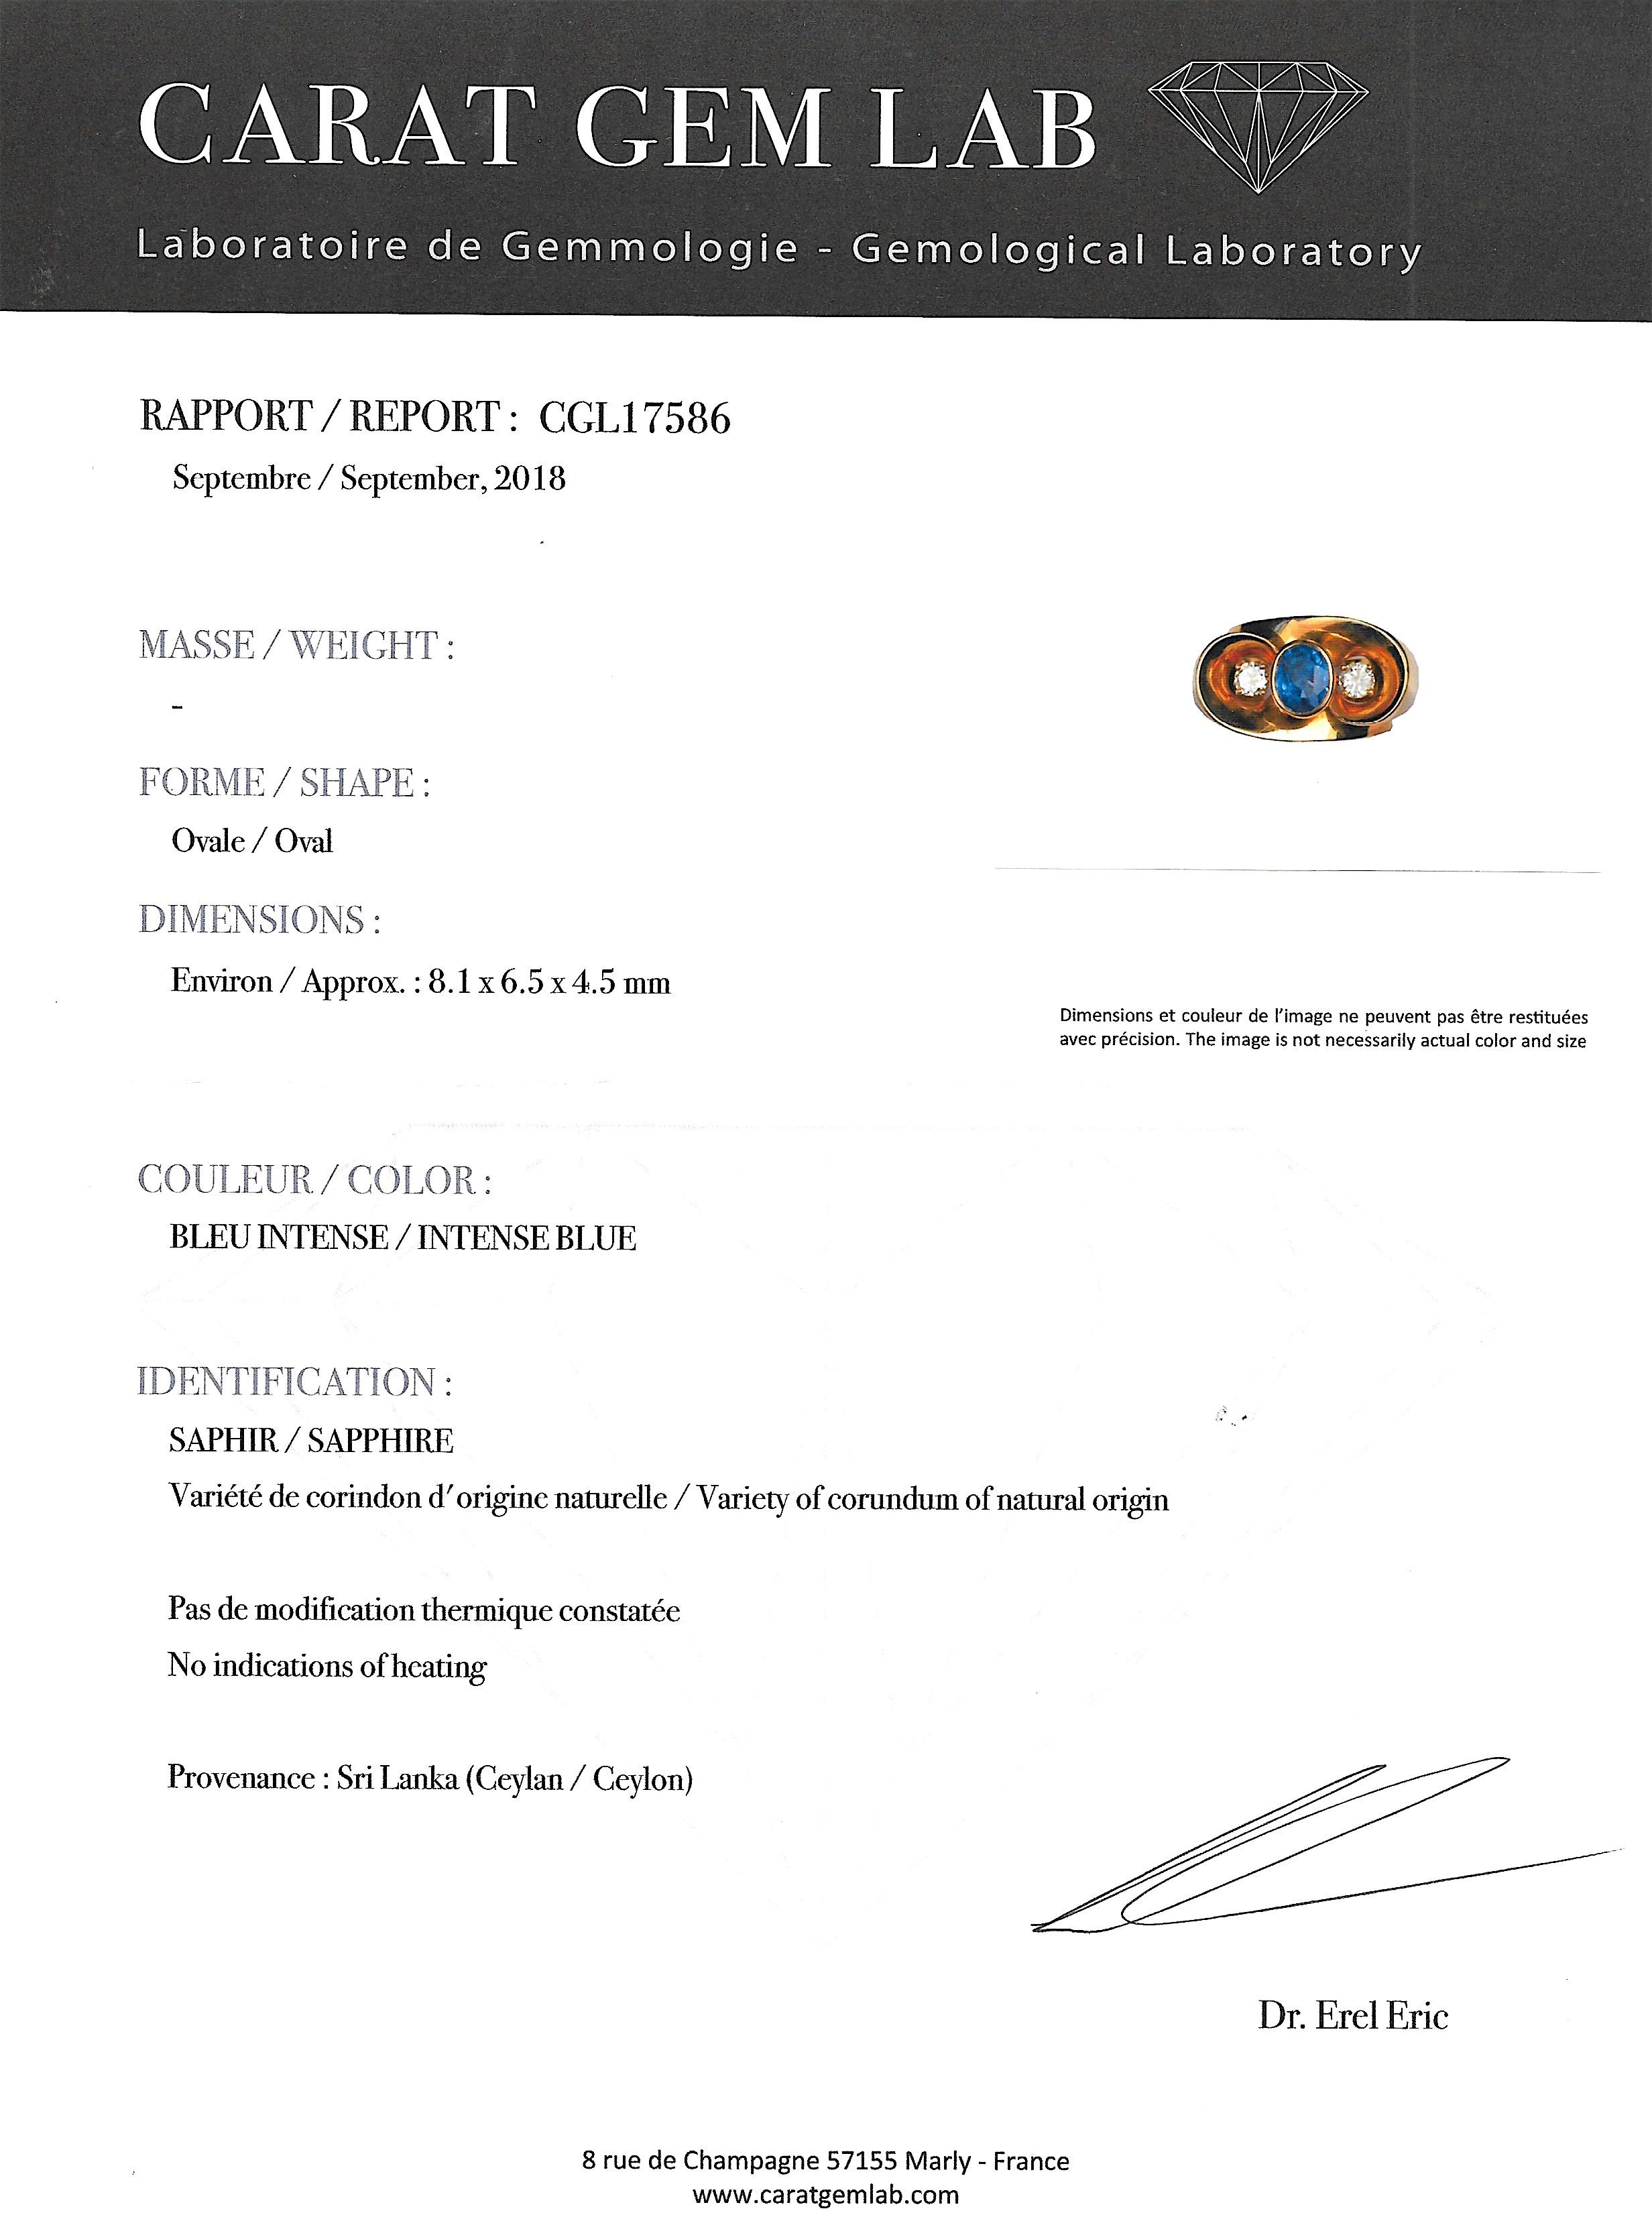 Bague saphir naturel (certificat CGL) diamants vers 1940 – 1950-3